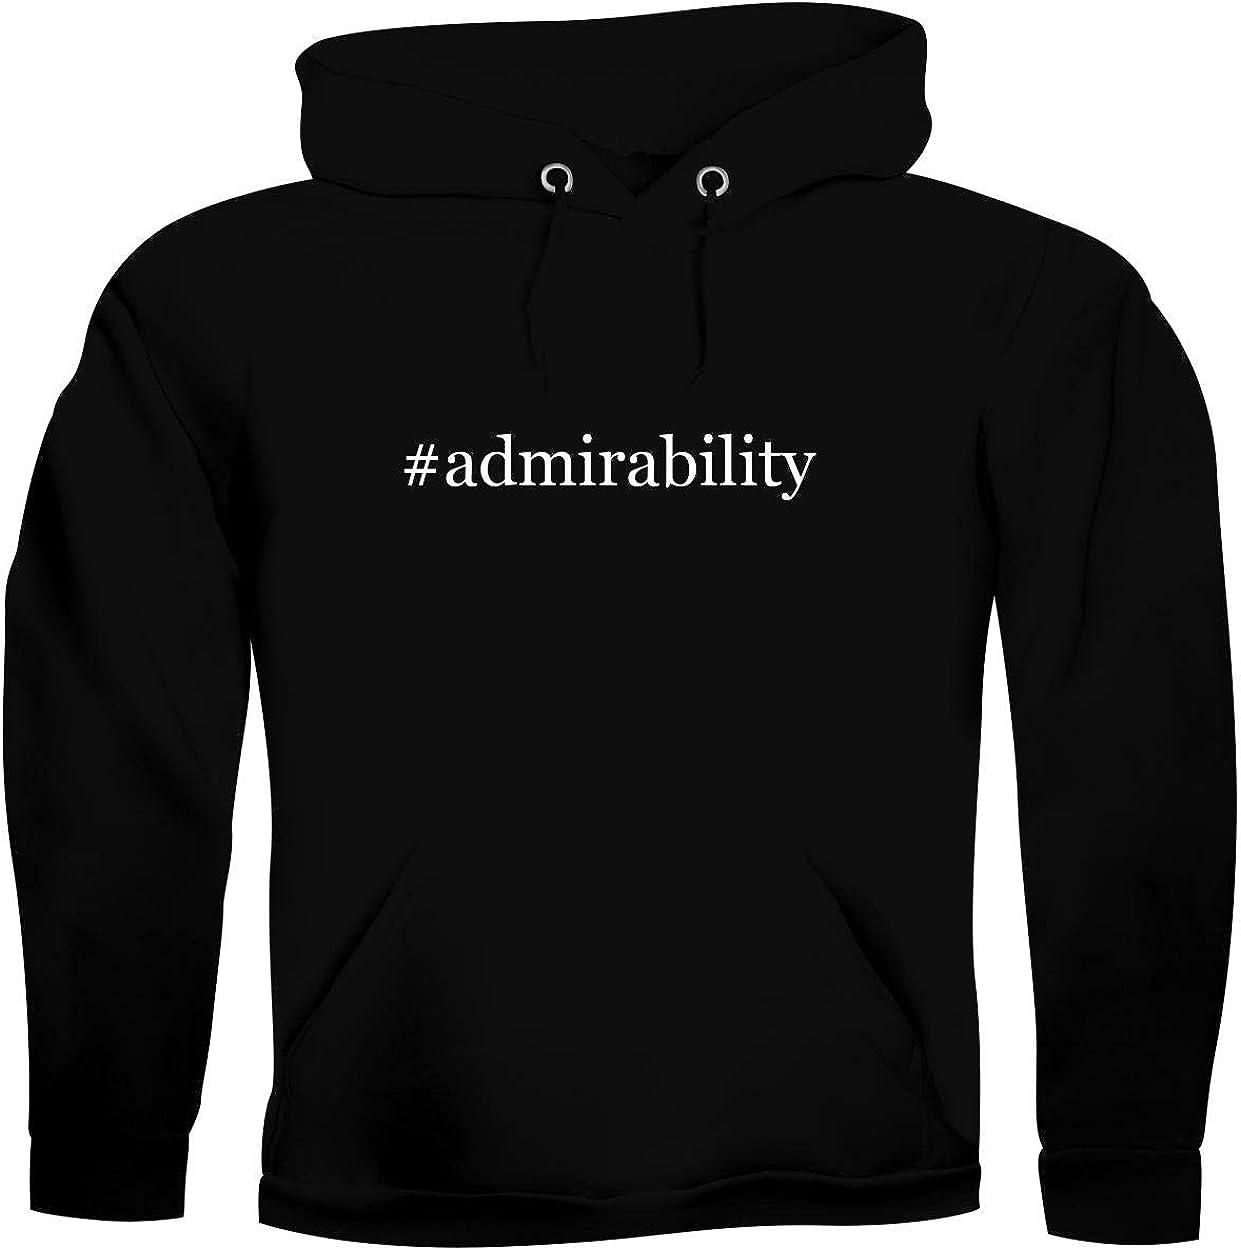 #admirability - Men's Hashtag Ultra Soft Hoodie Sweatshirt